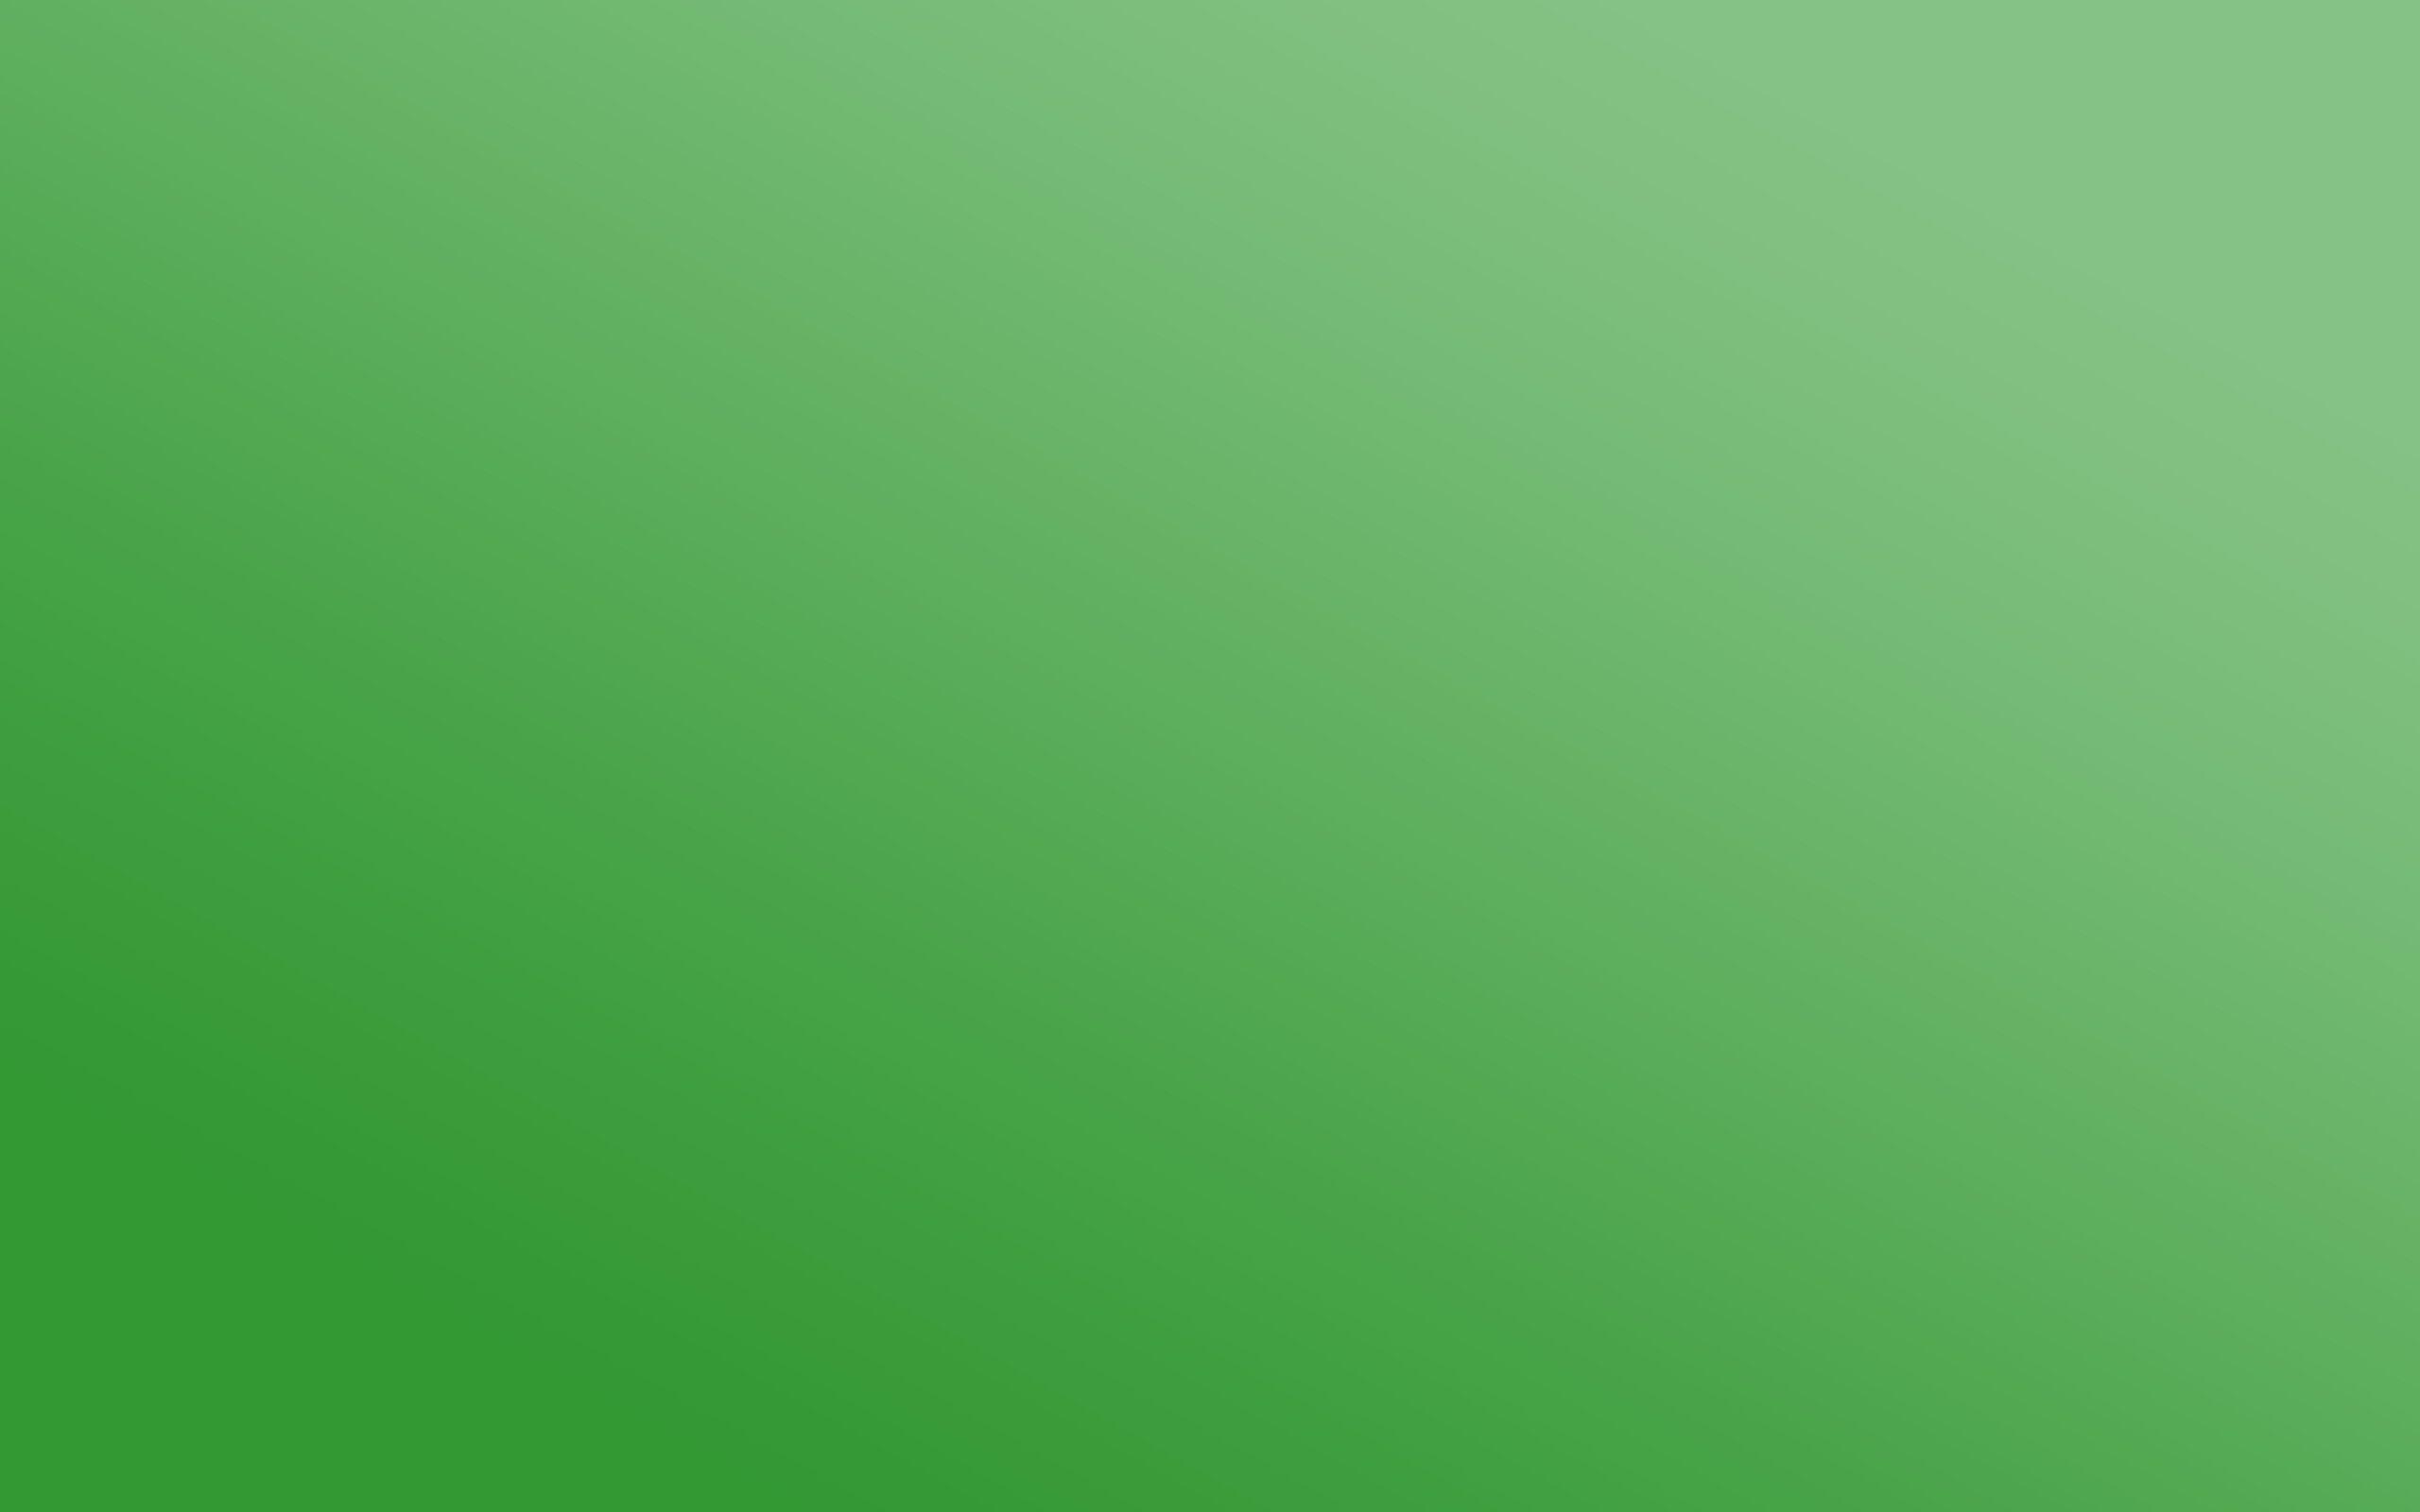 Tinta Unita Verde Carta Da Parati Istruzione Sfondi A Tinta